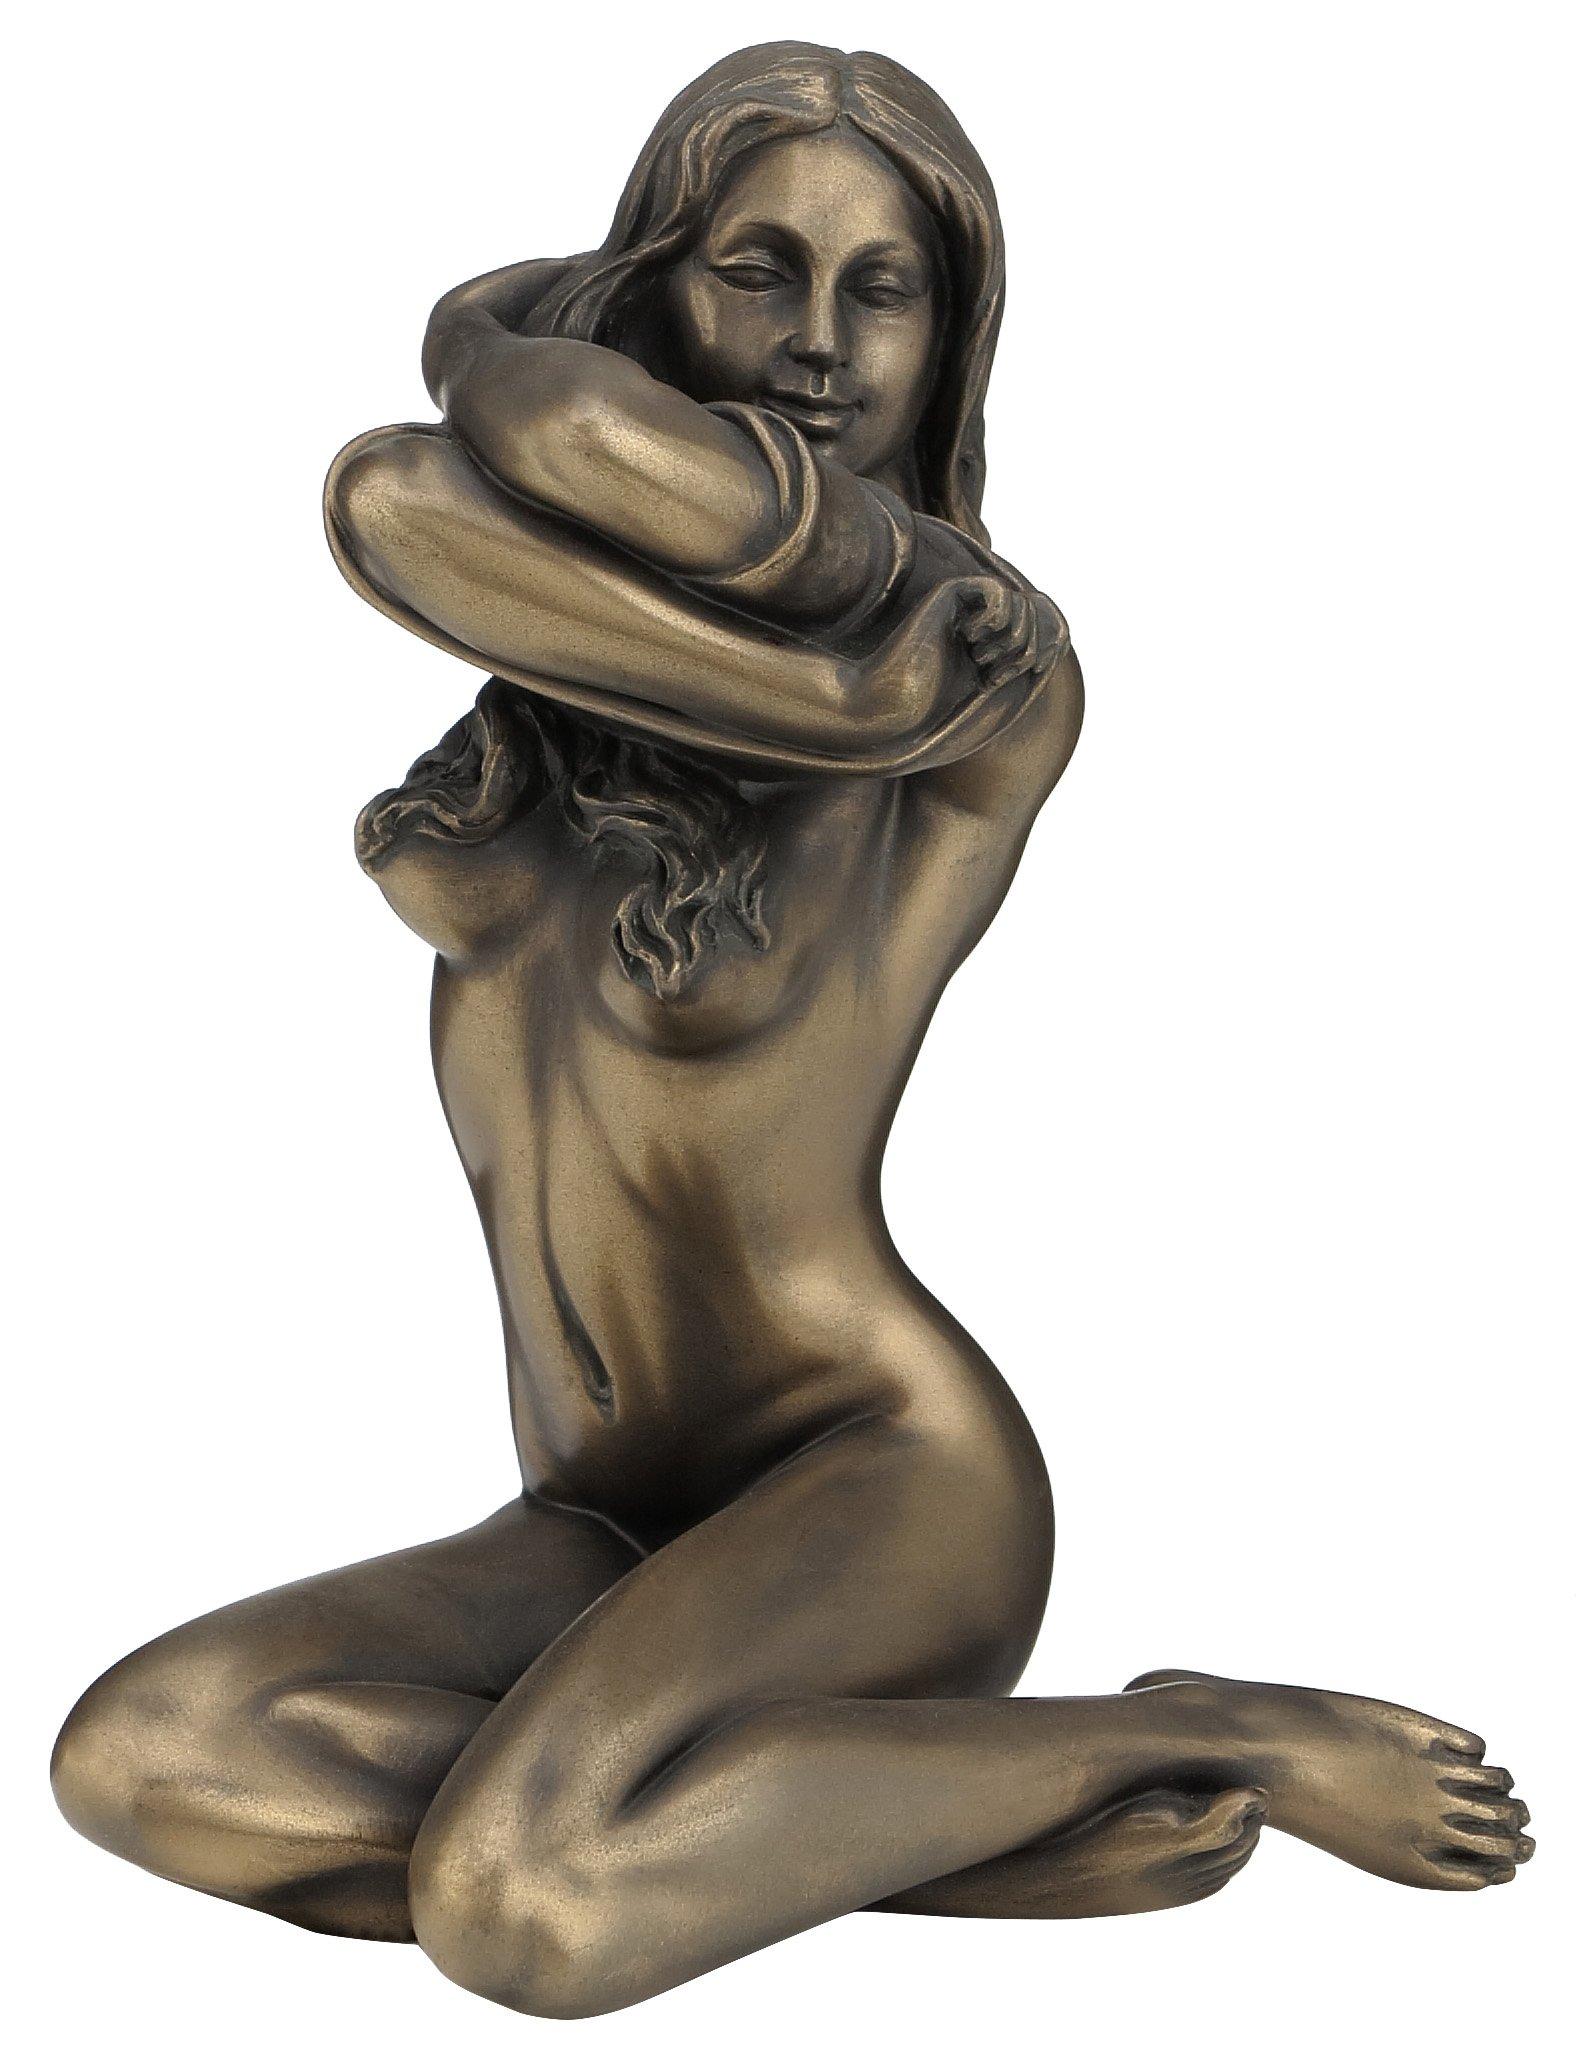 Len gifford erotic sculpture, biggest tranny tube